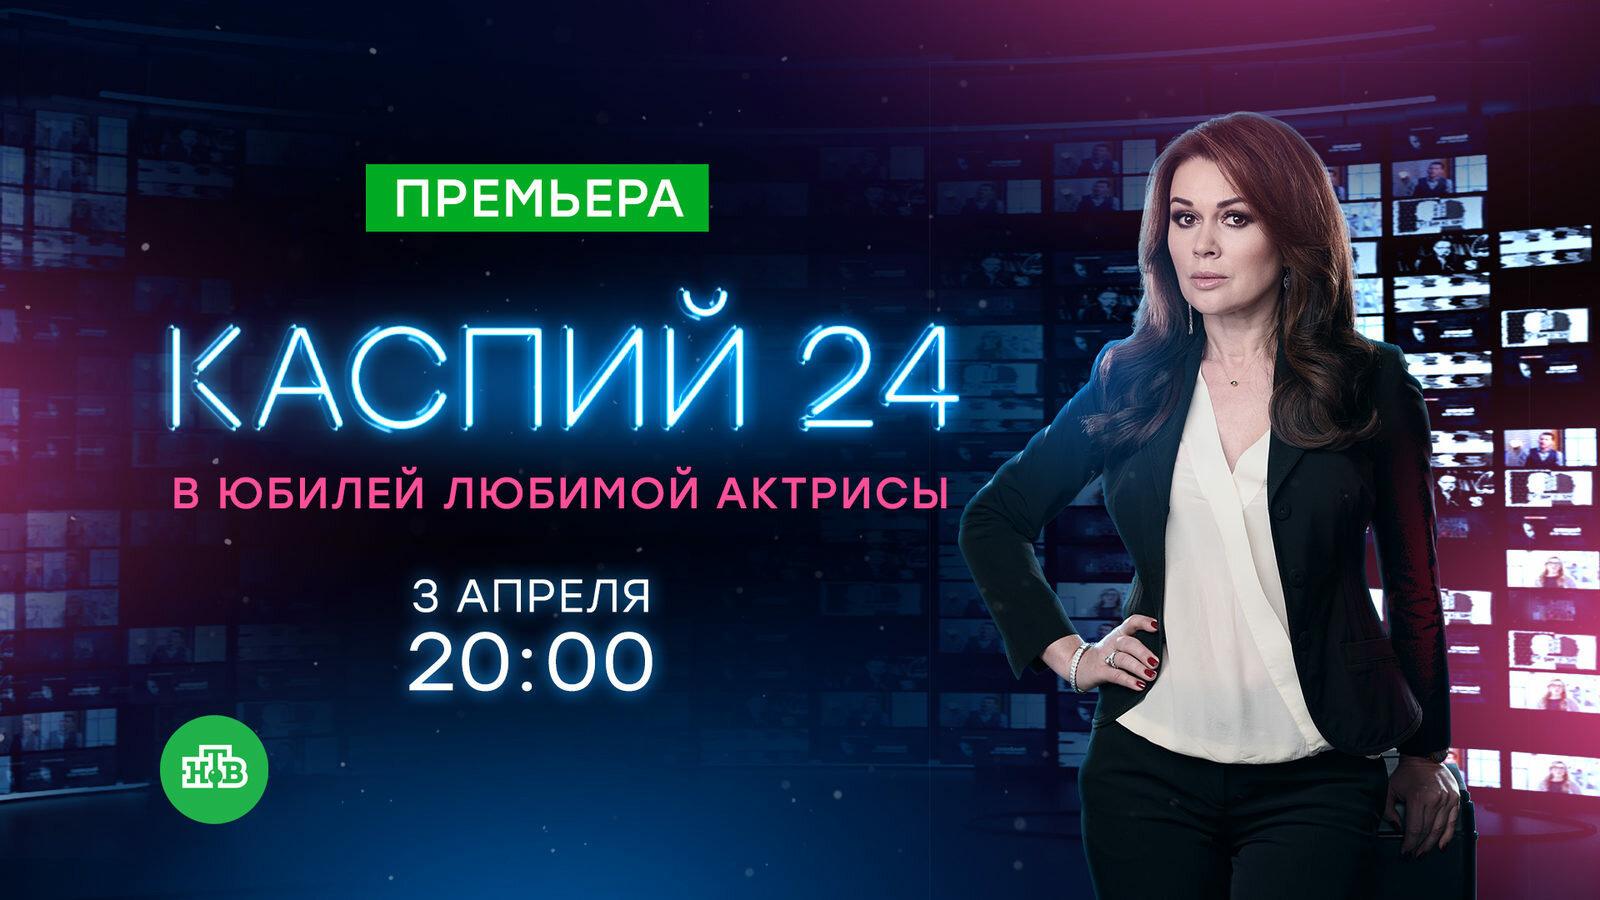 Show Каспий 24